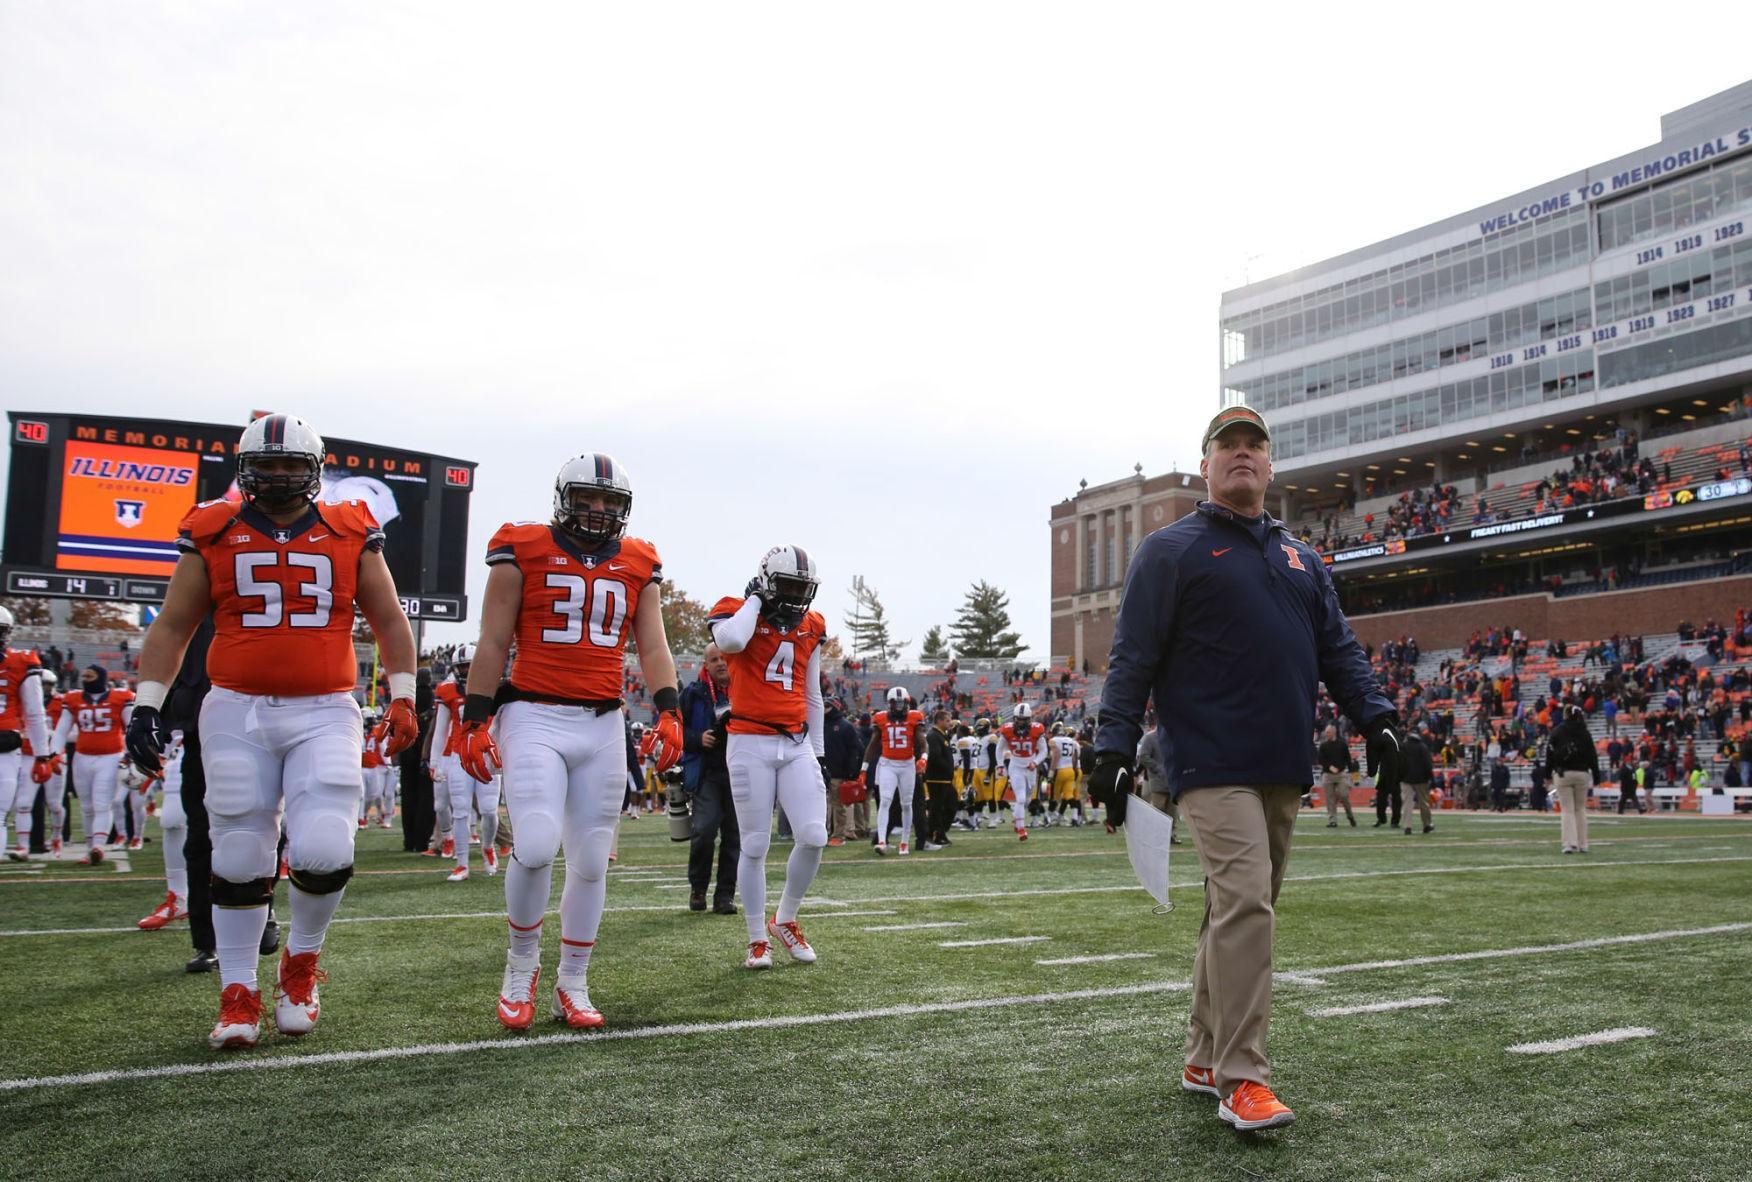 Illinois' head coach Tim Beckman walks towards the